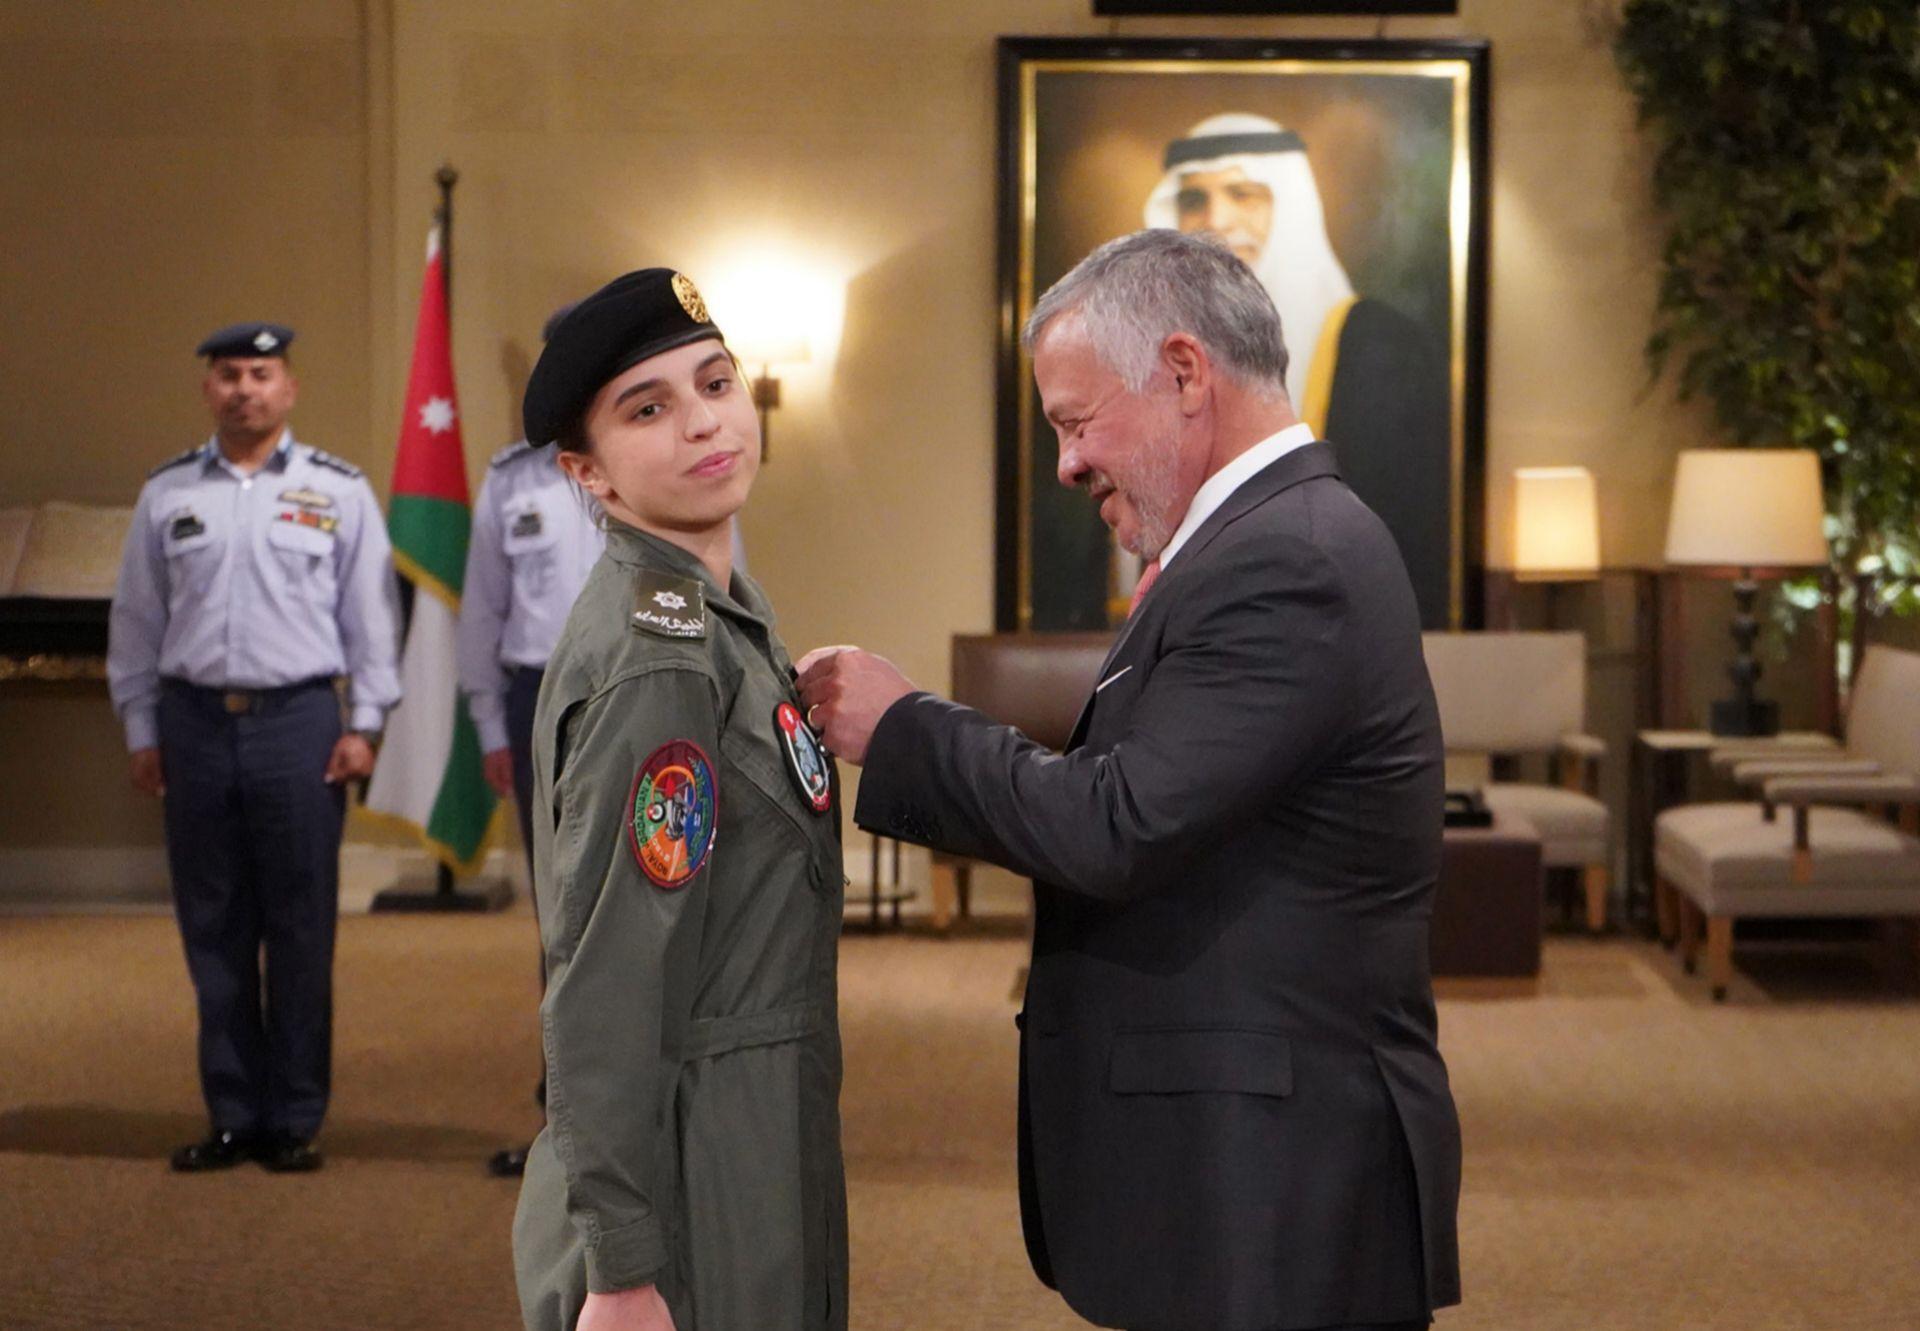 La princesa Salma condecorada por su padre.